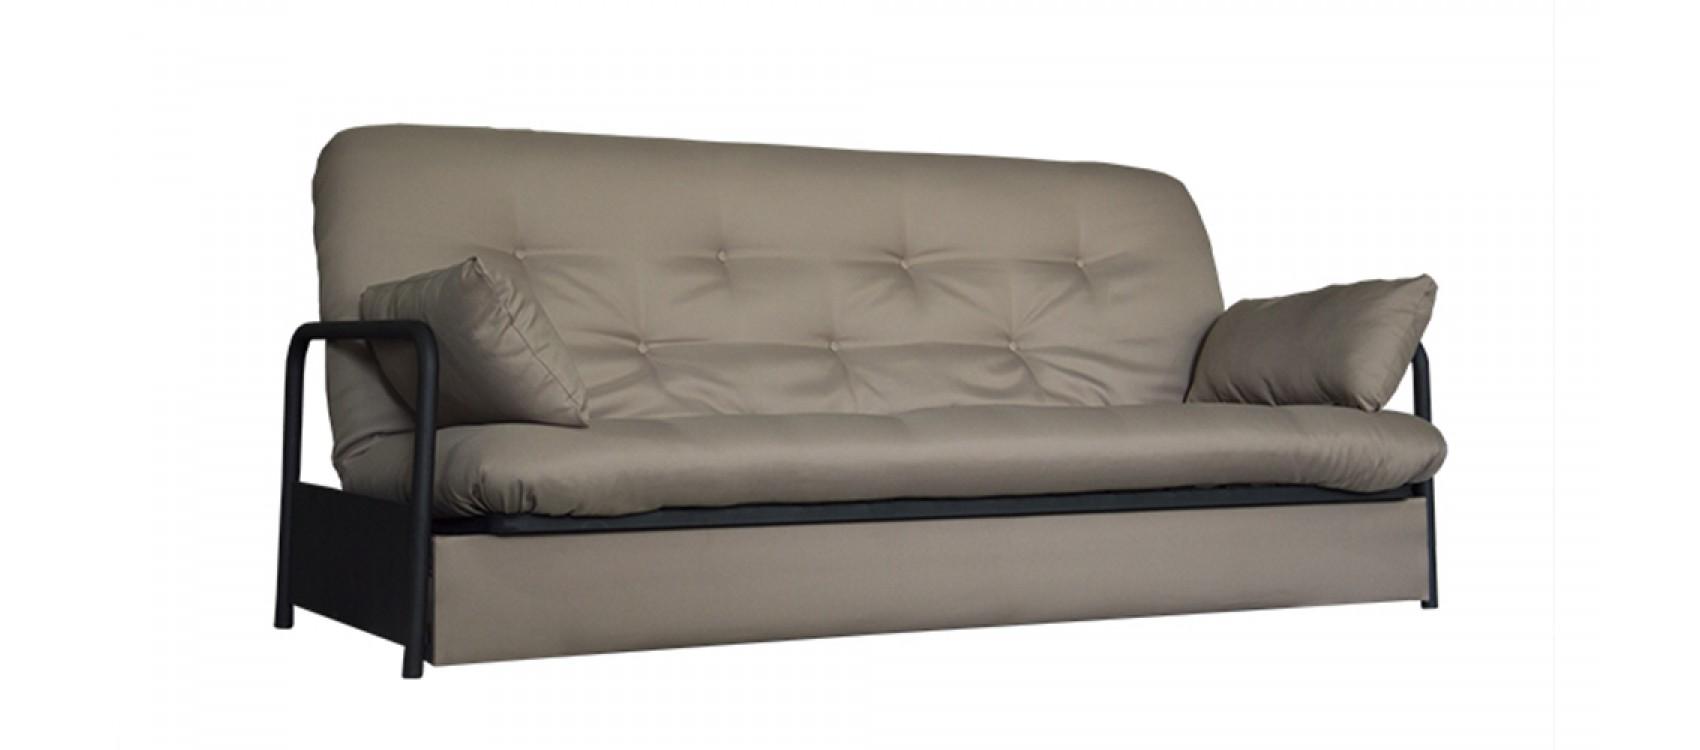 Sofa FIJI foto 8